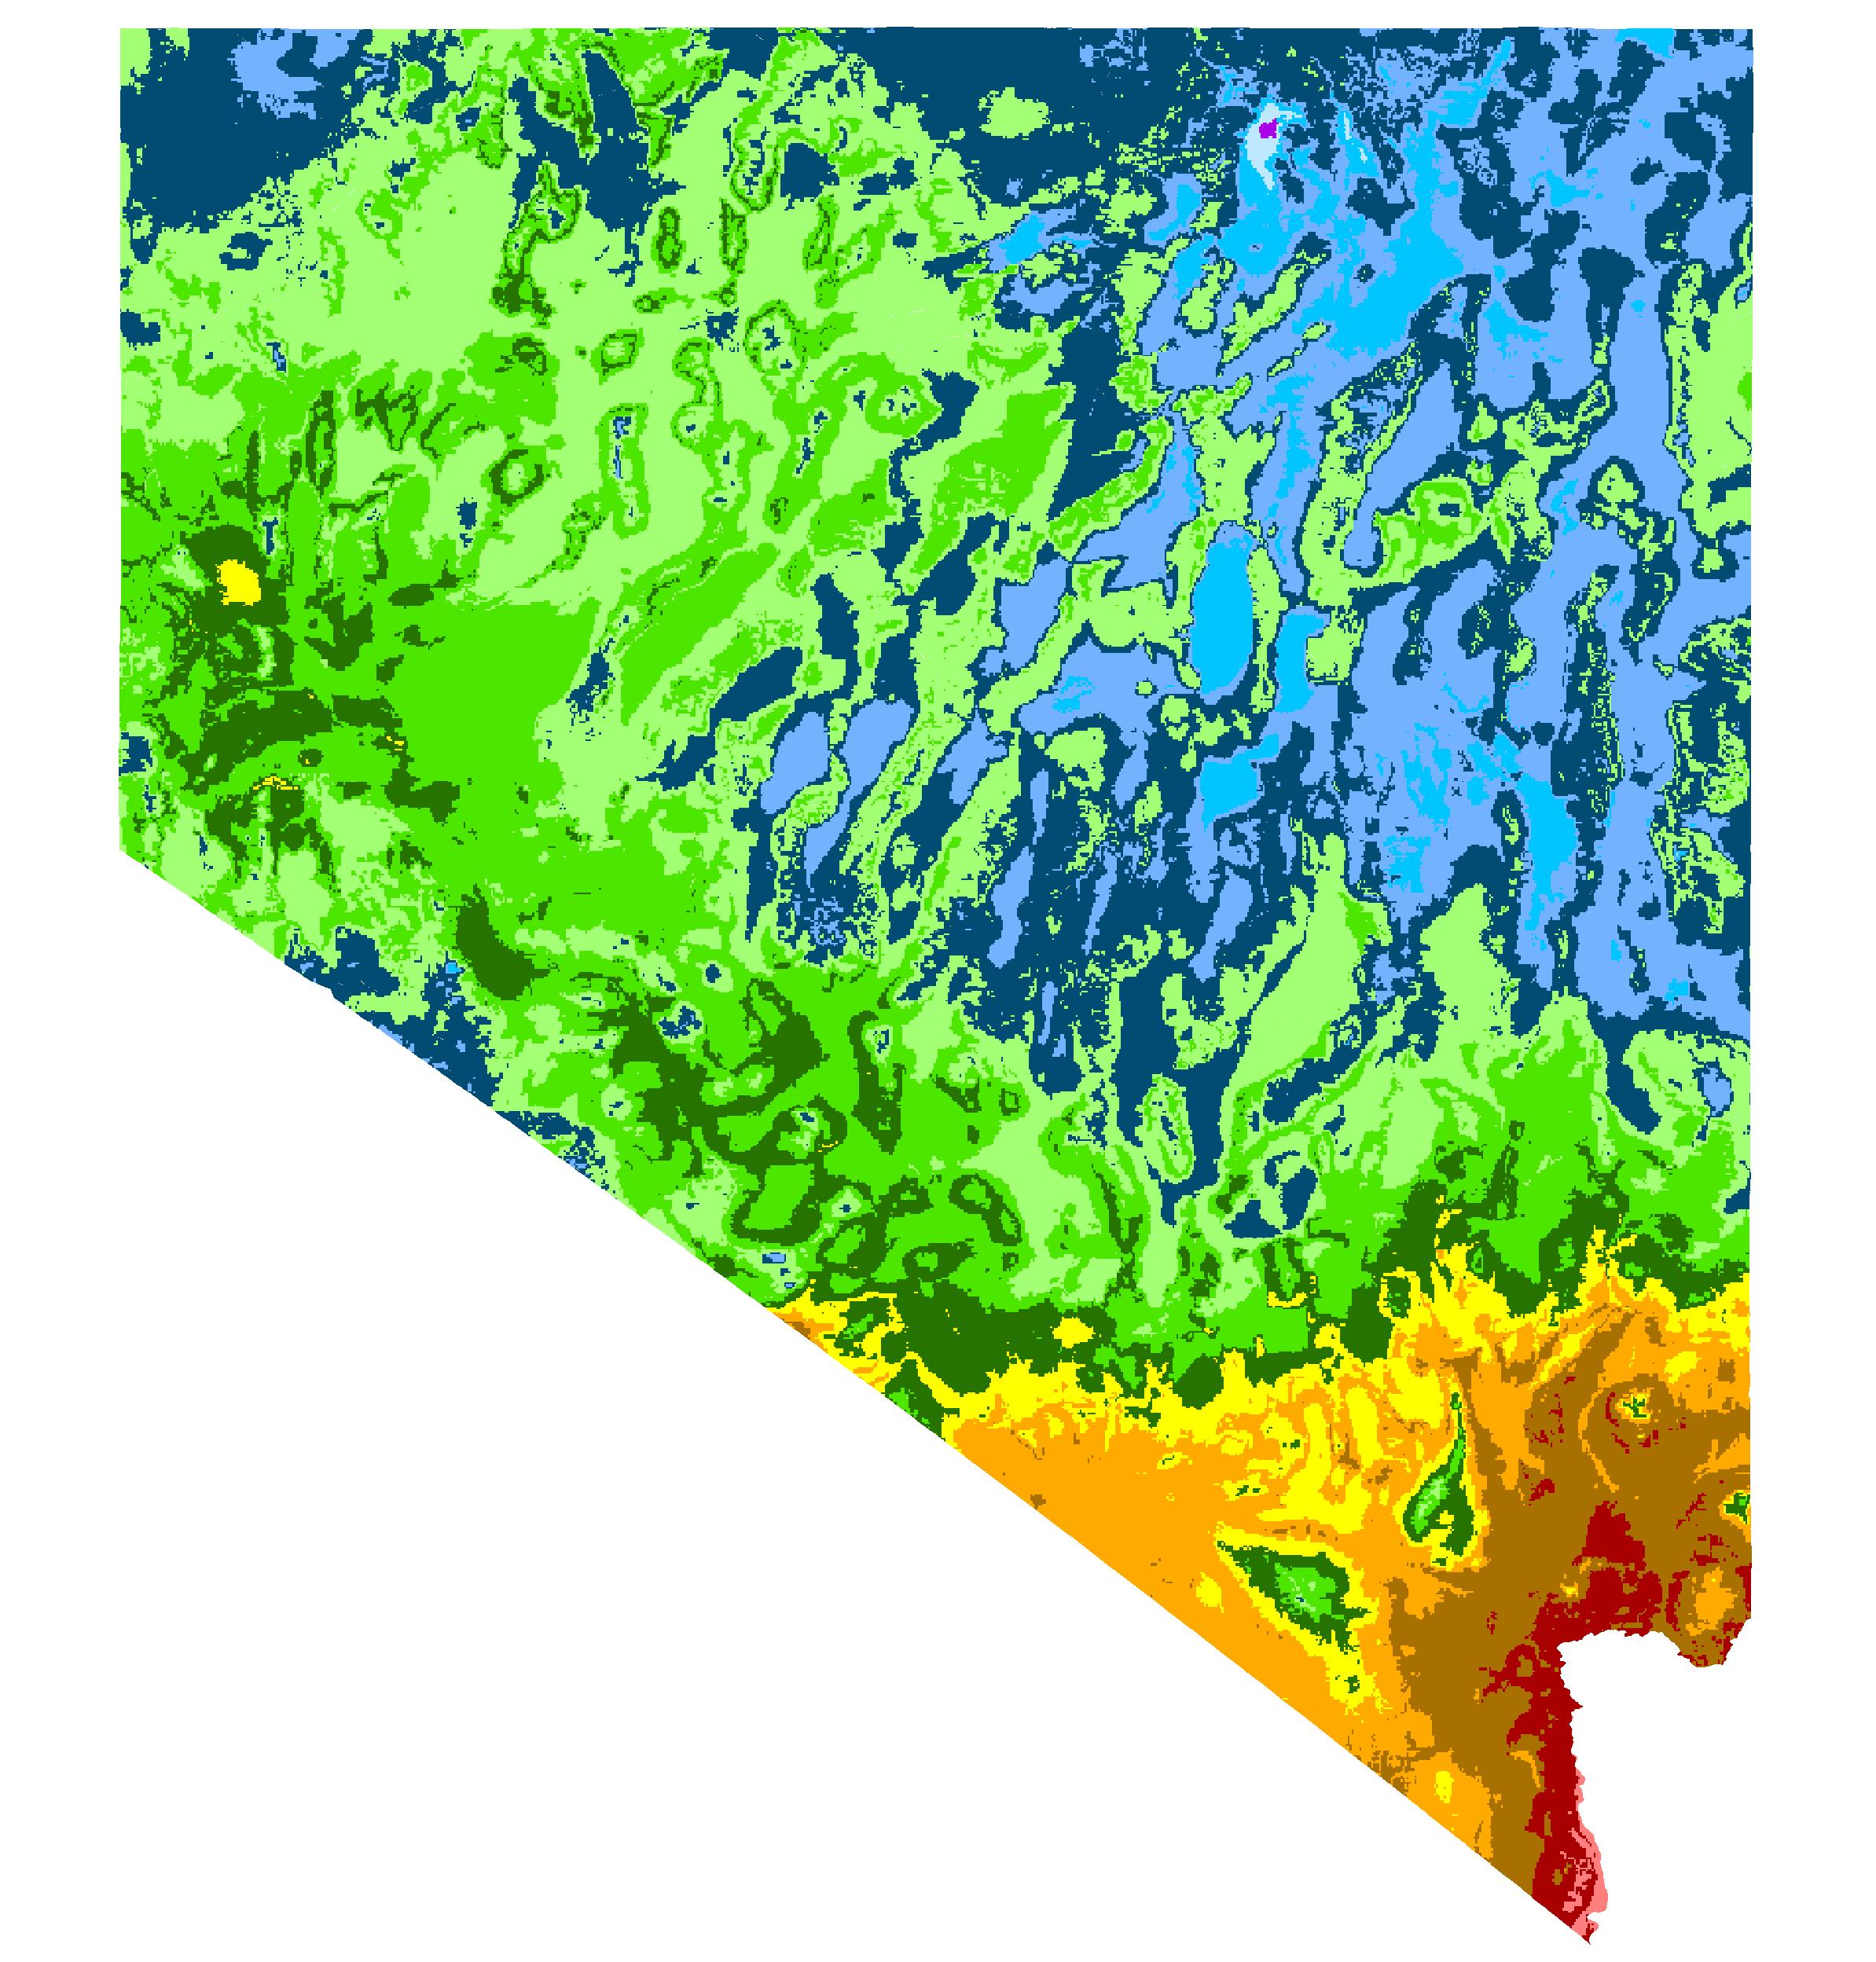 Fernley, Nevada Hardiness Zones